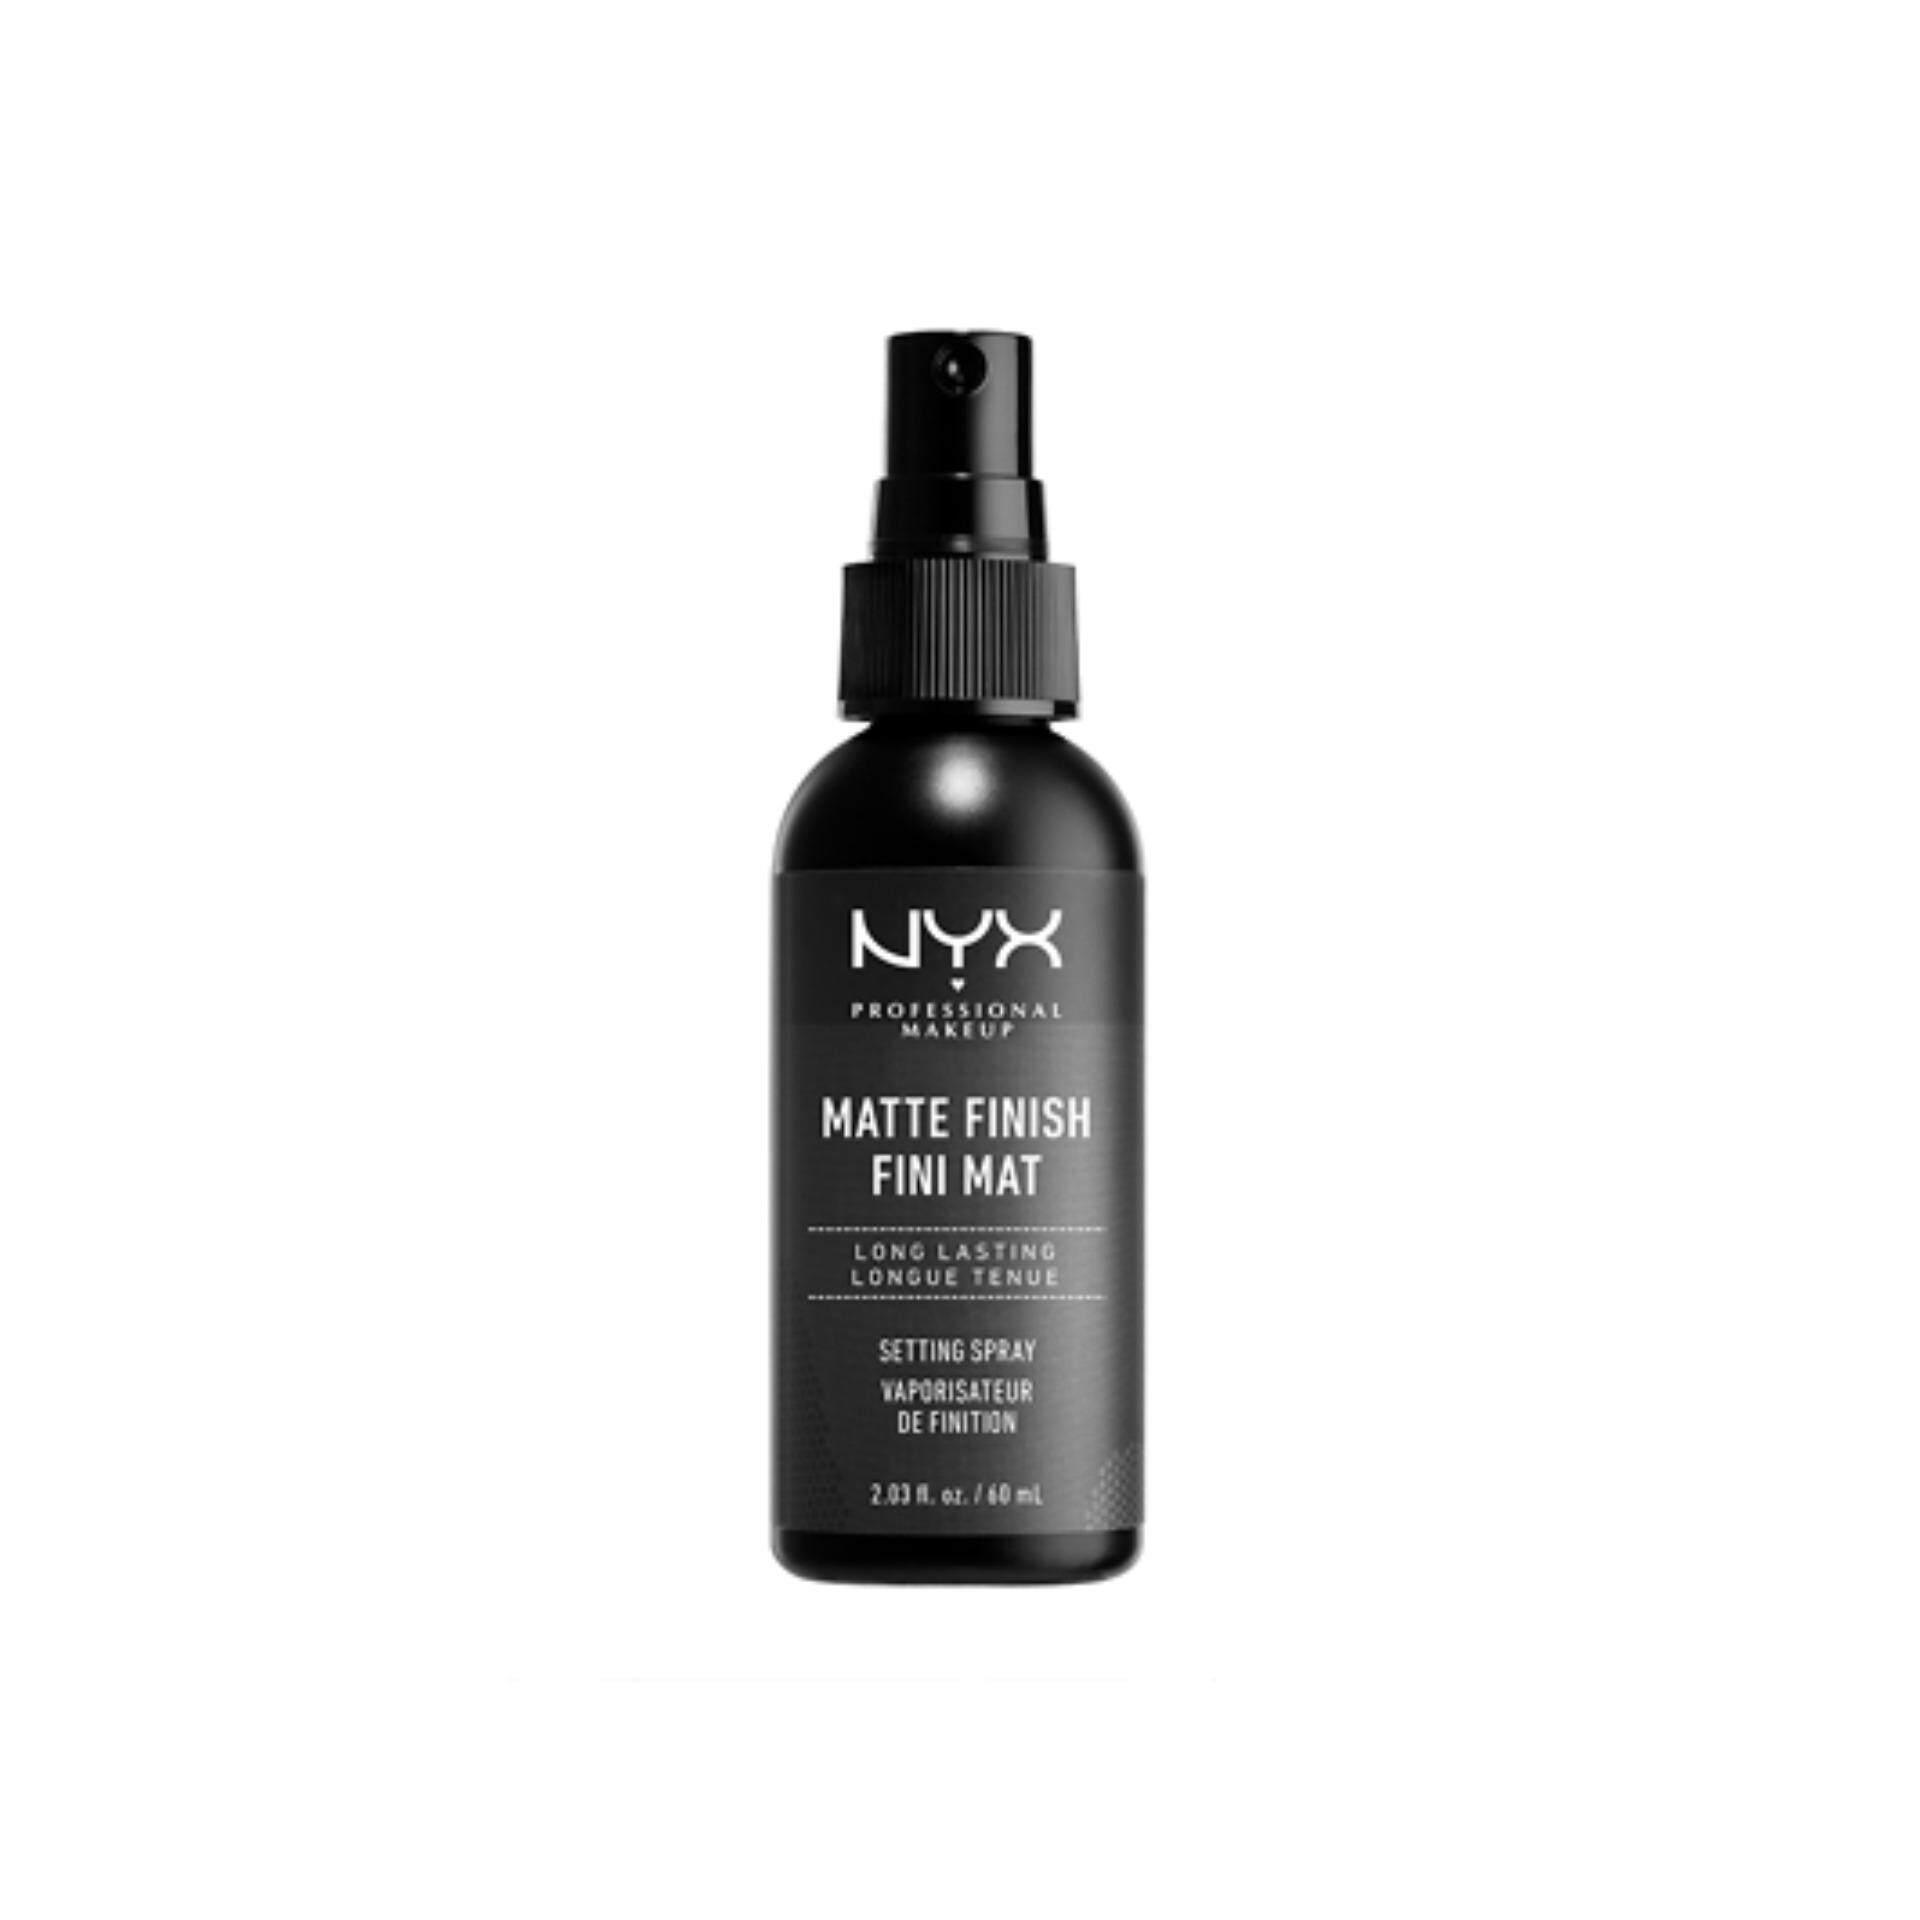 1 x N.Y.X PROFESSIONAL MAKEUP Makeup Setting Spray - MATTE FINISH [LONG LASTING]